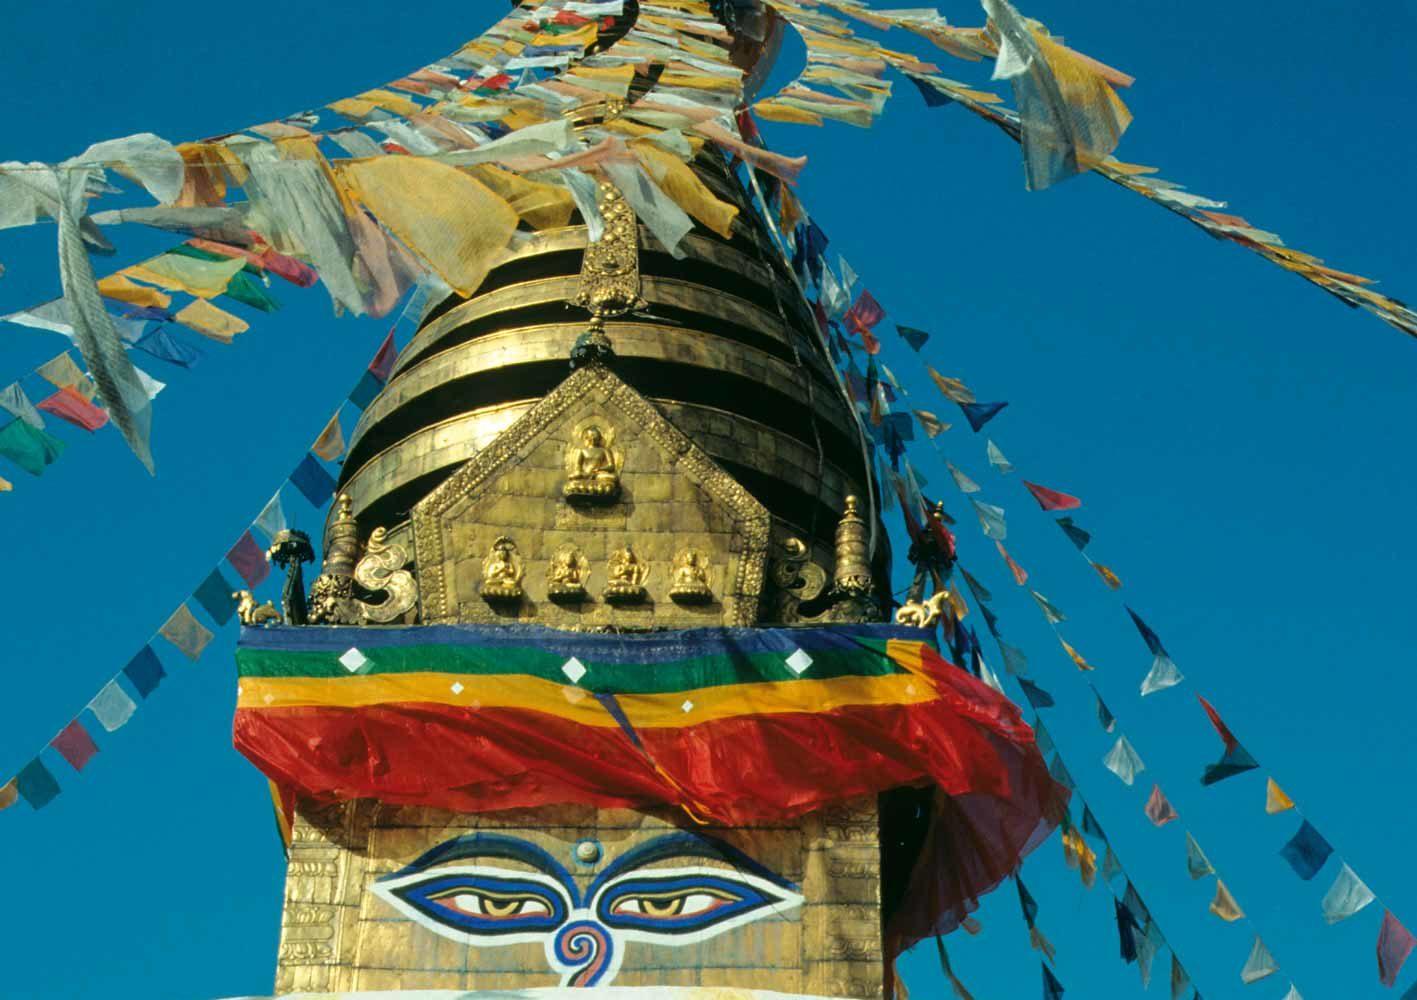 Besichtigung der Tempel im Kathmandu-Tal, Nepal